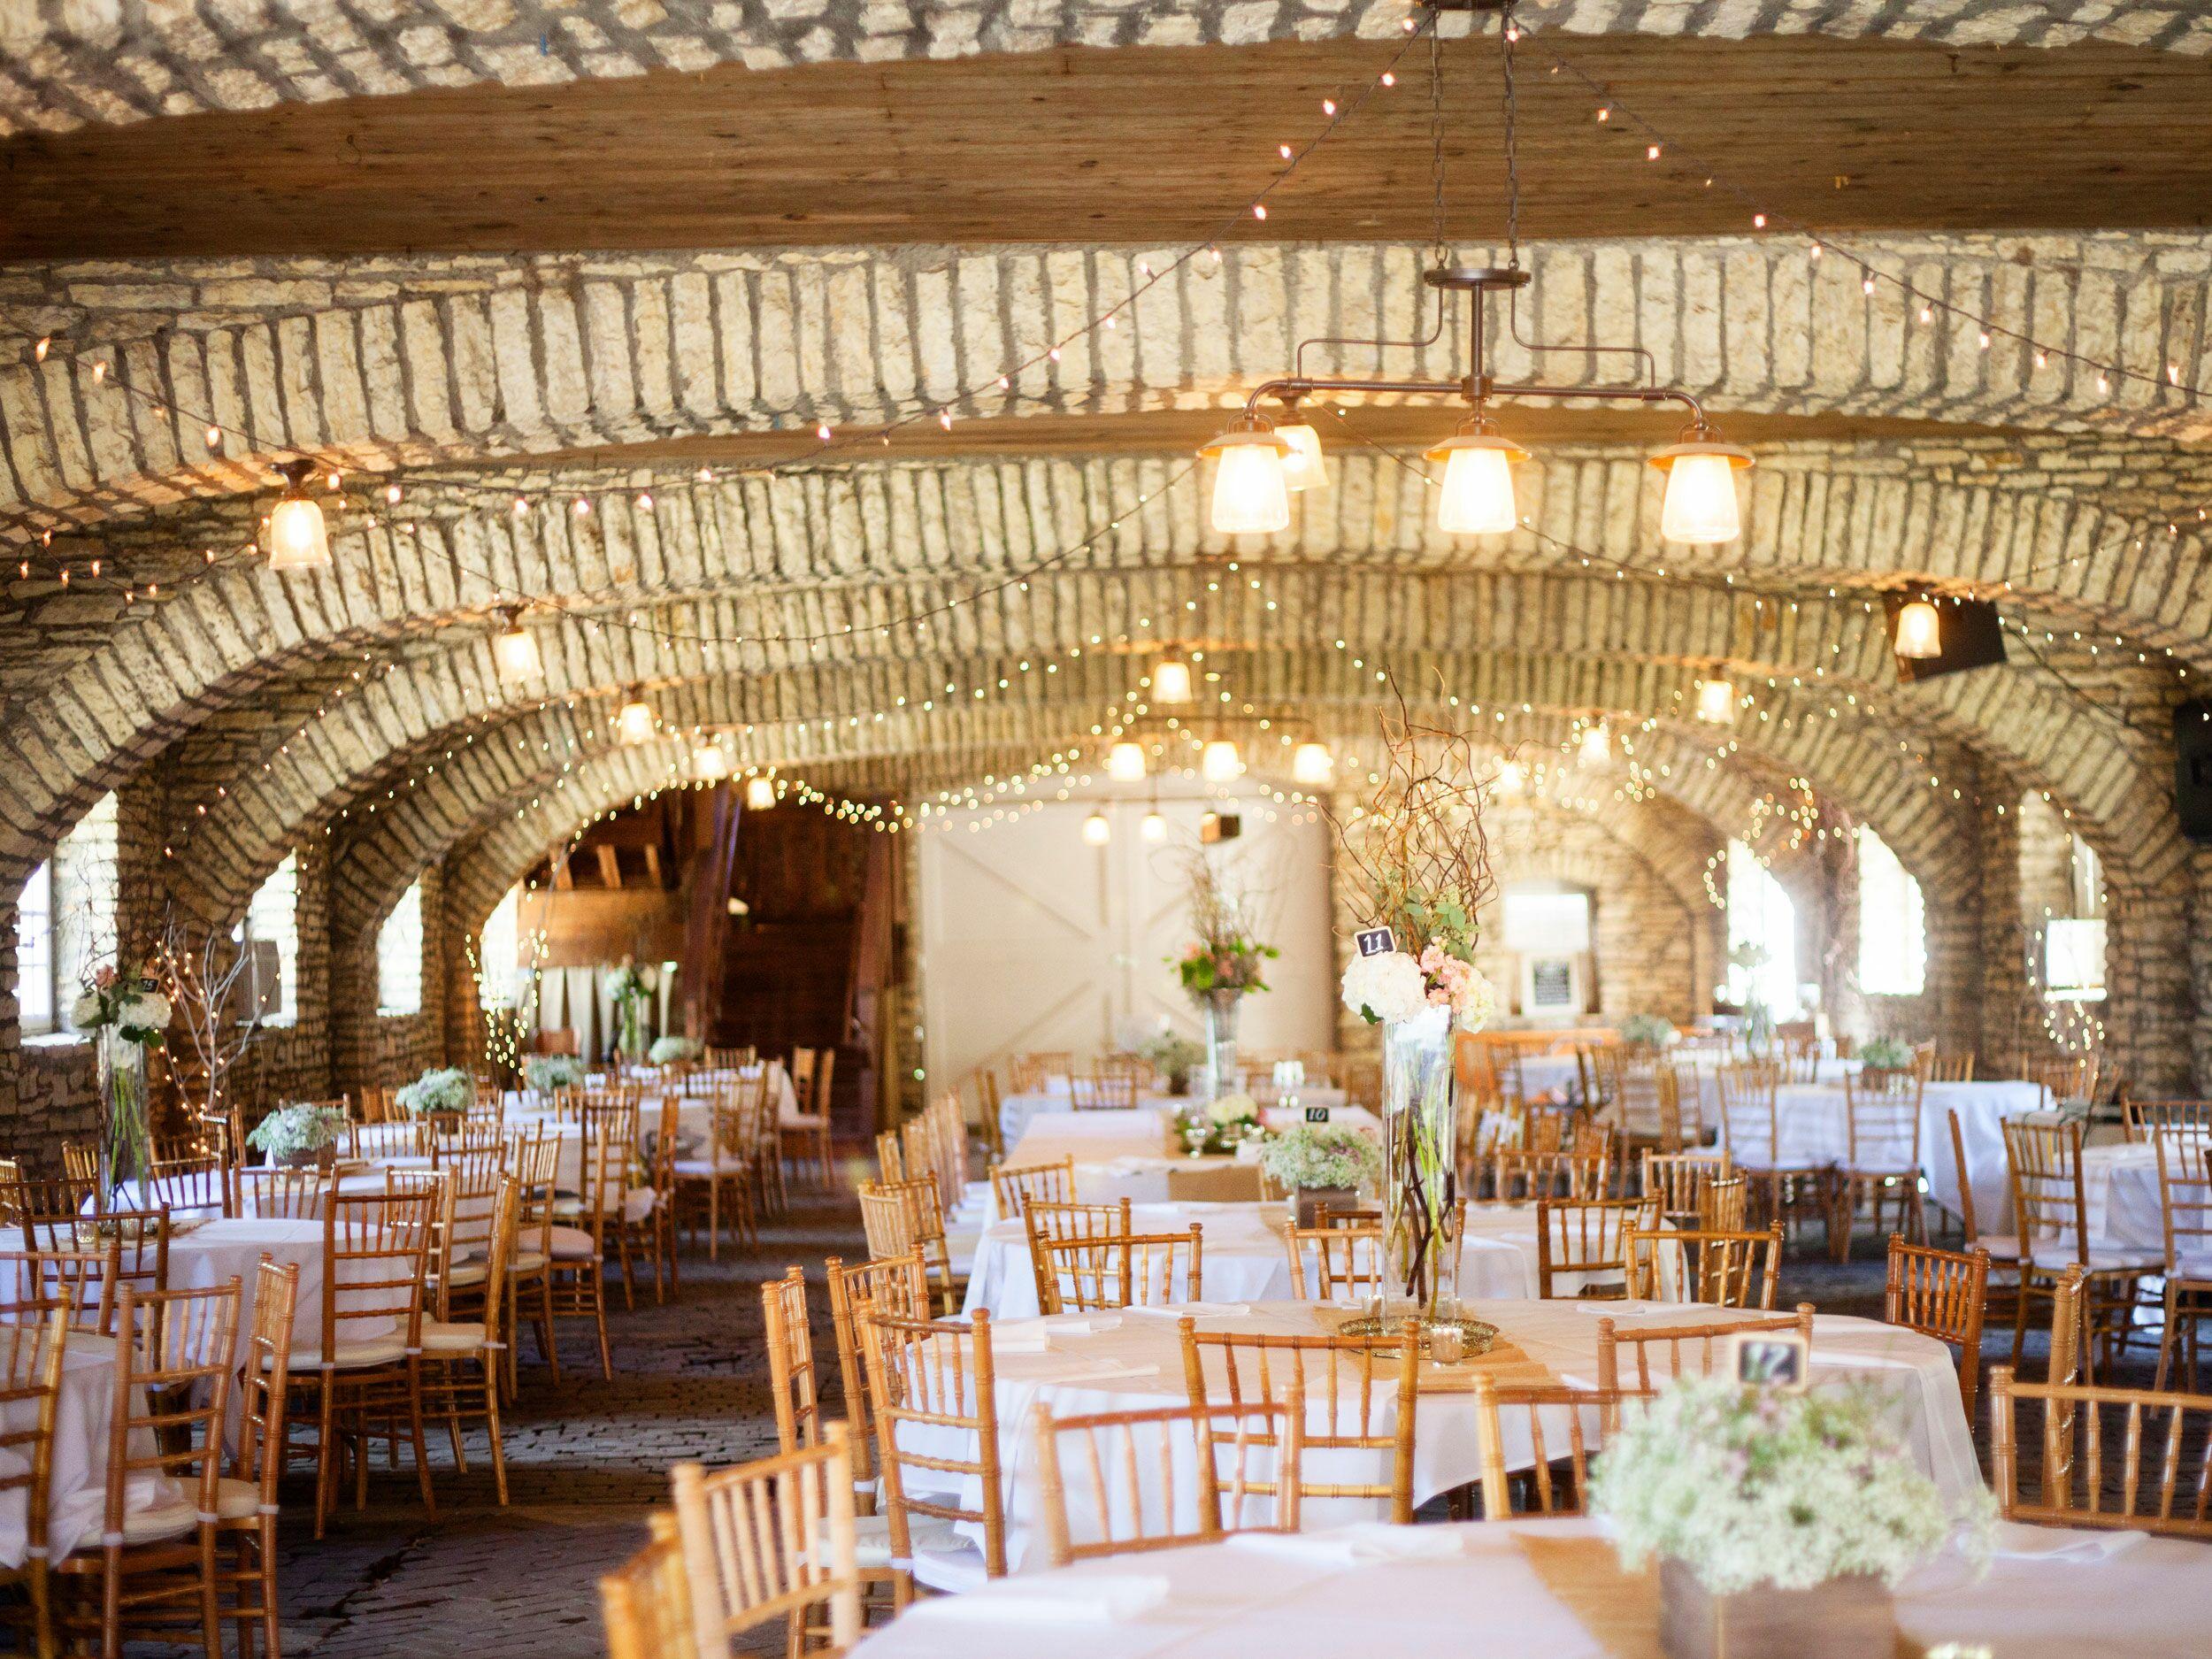 Maywood Barn Wedding Reception 10 Minnesota Venues